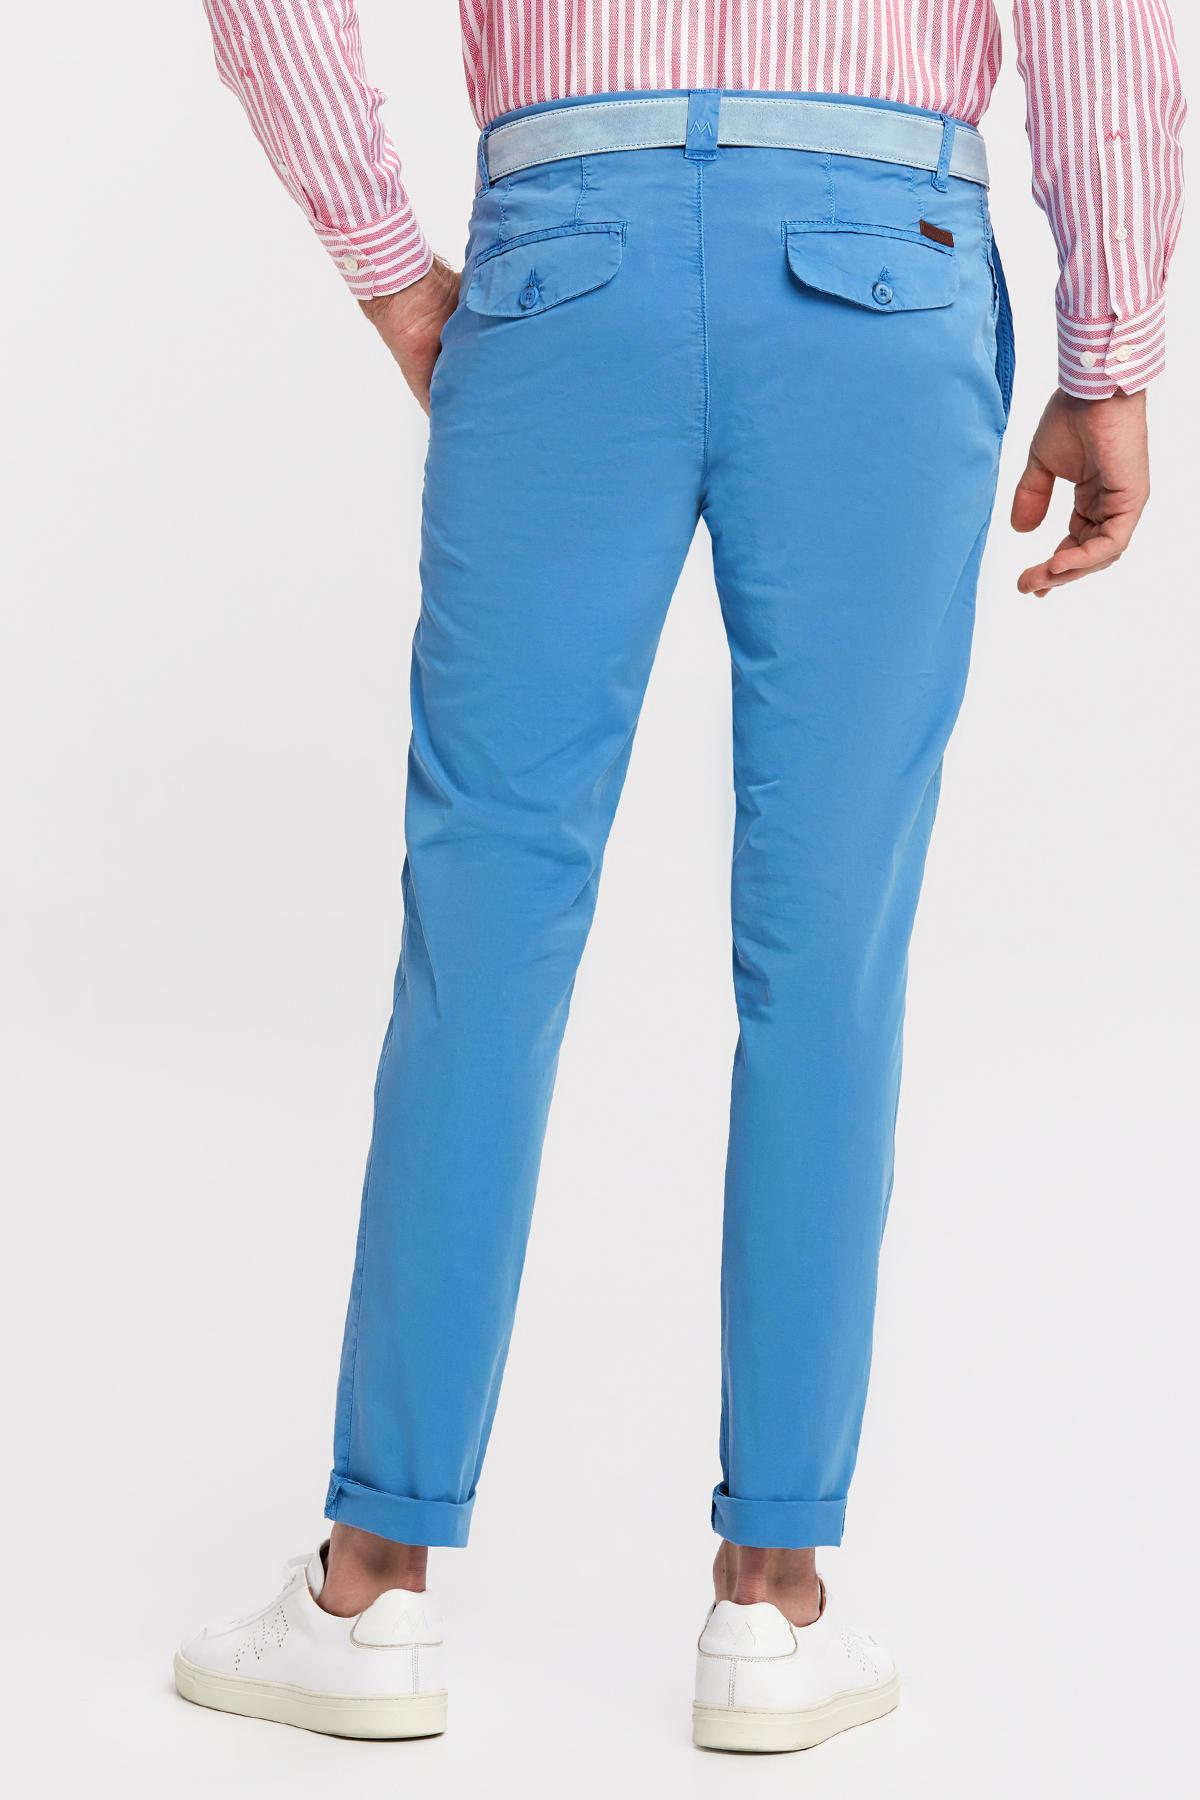 Mavi Pamuk Yazlık Chino Pantolon